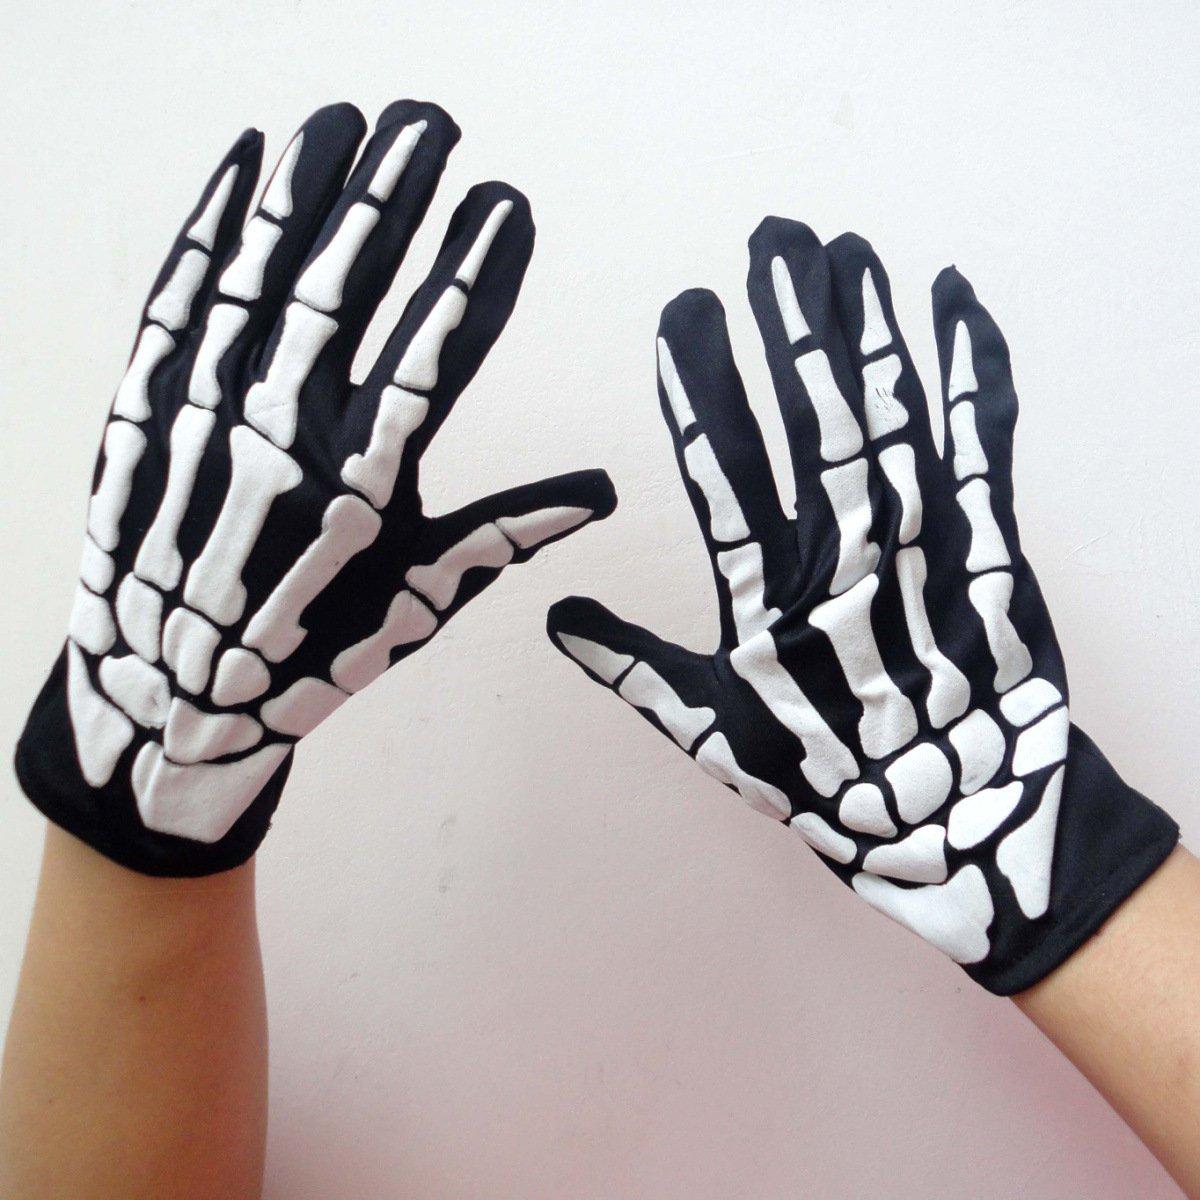 Halloween Supplies Decorations Terror Skeleton Gloves Gloves Cloth Bags